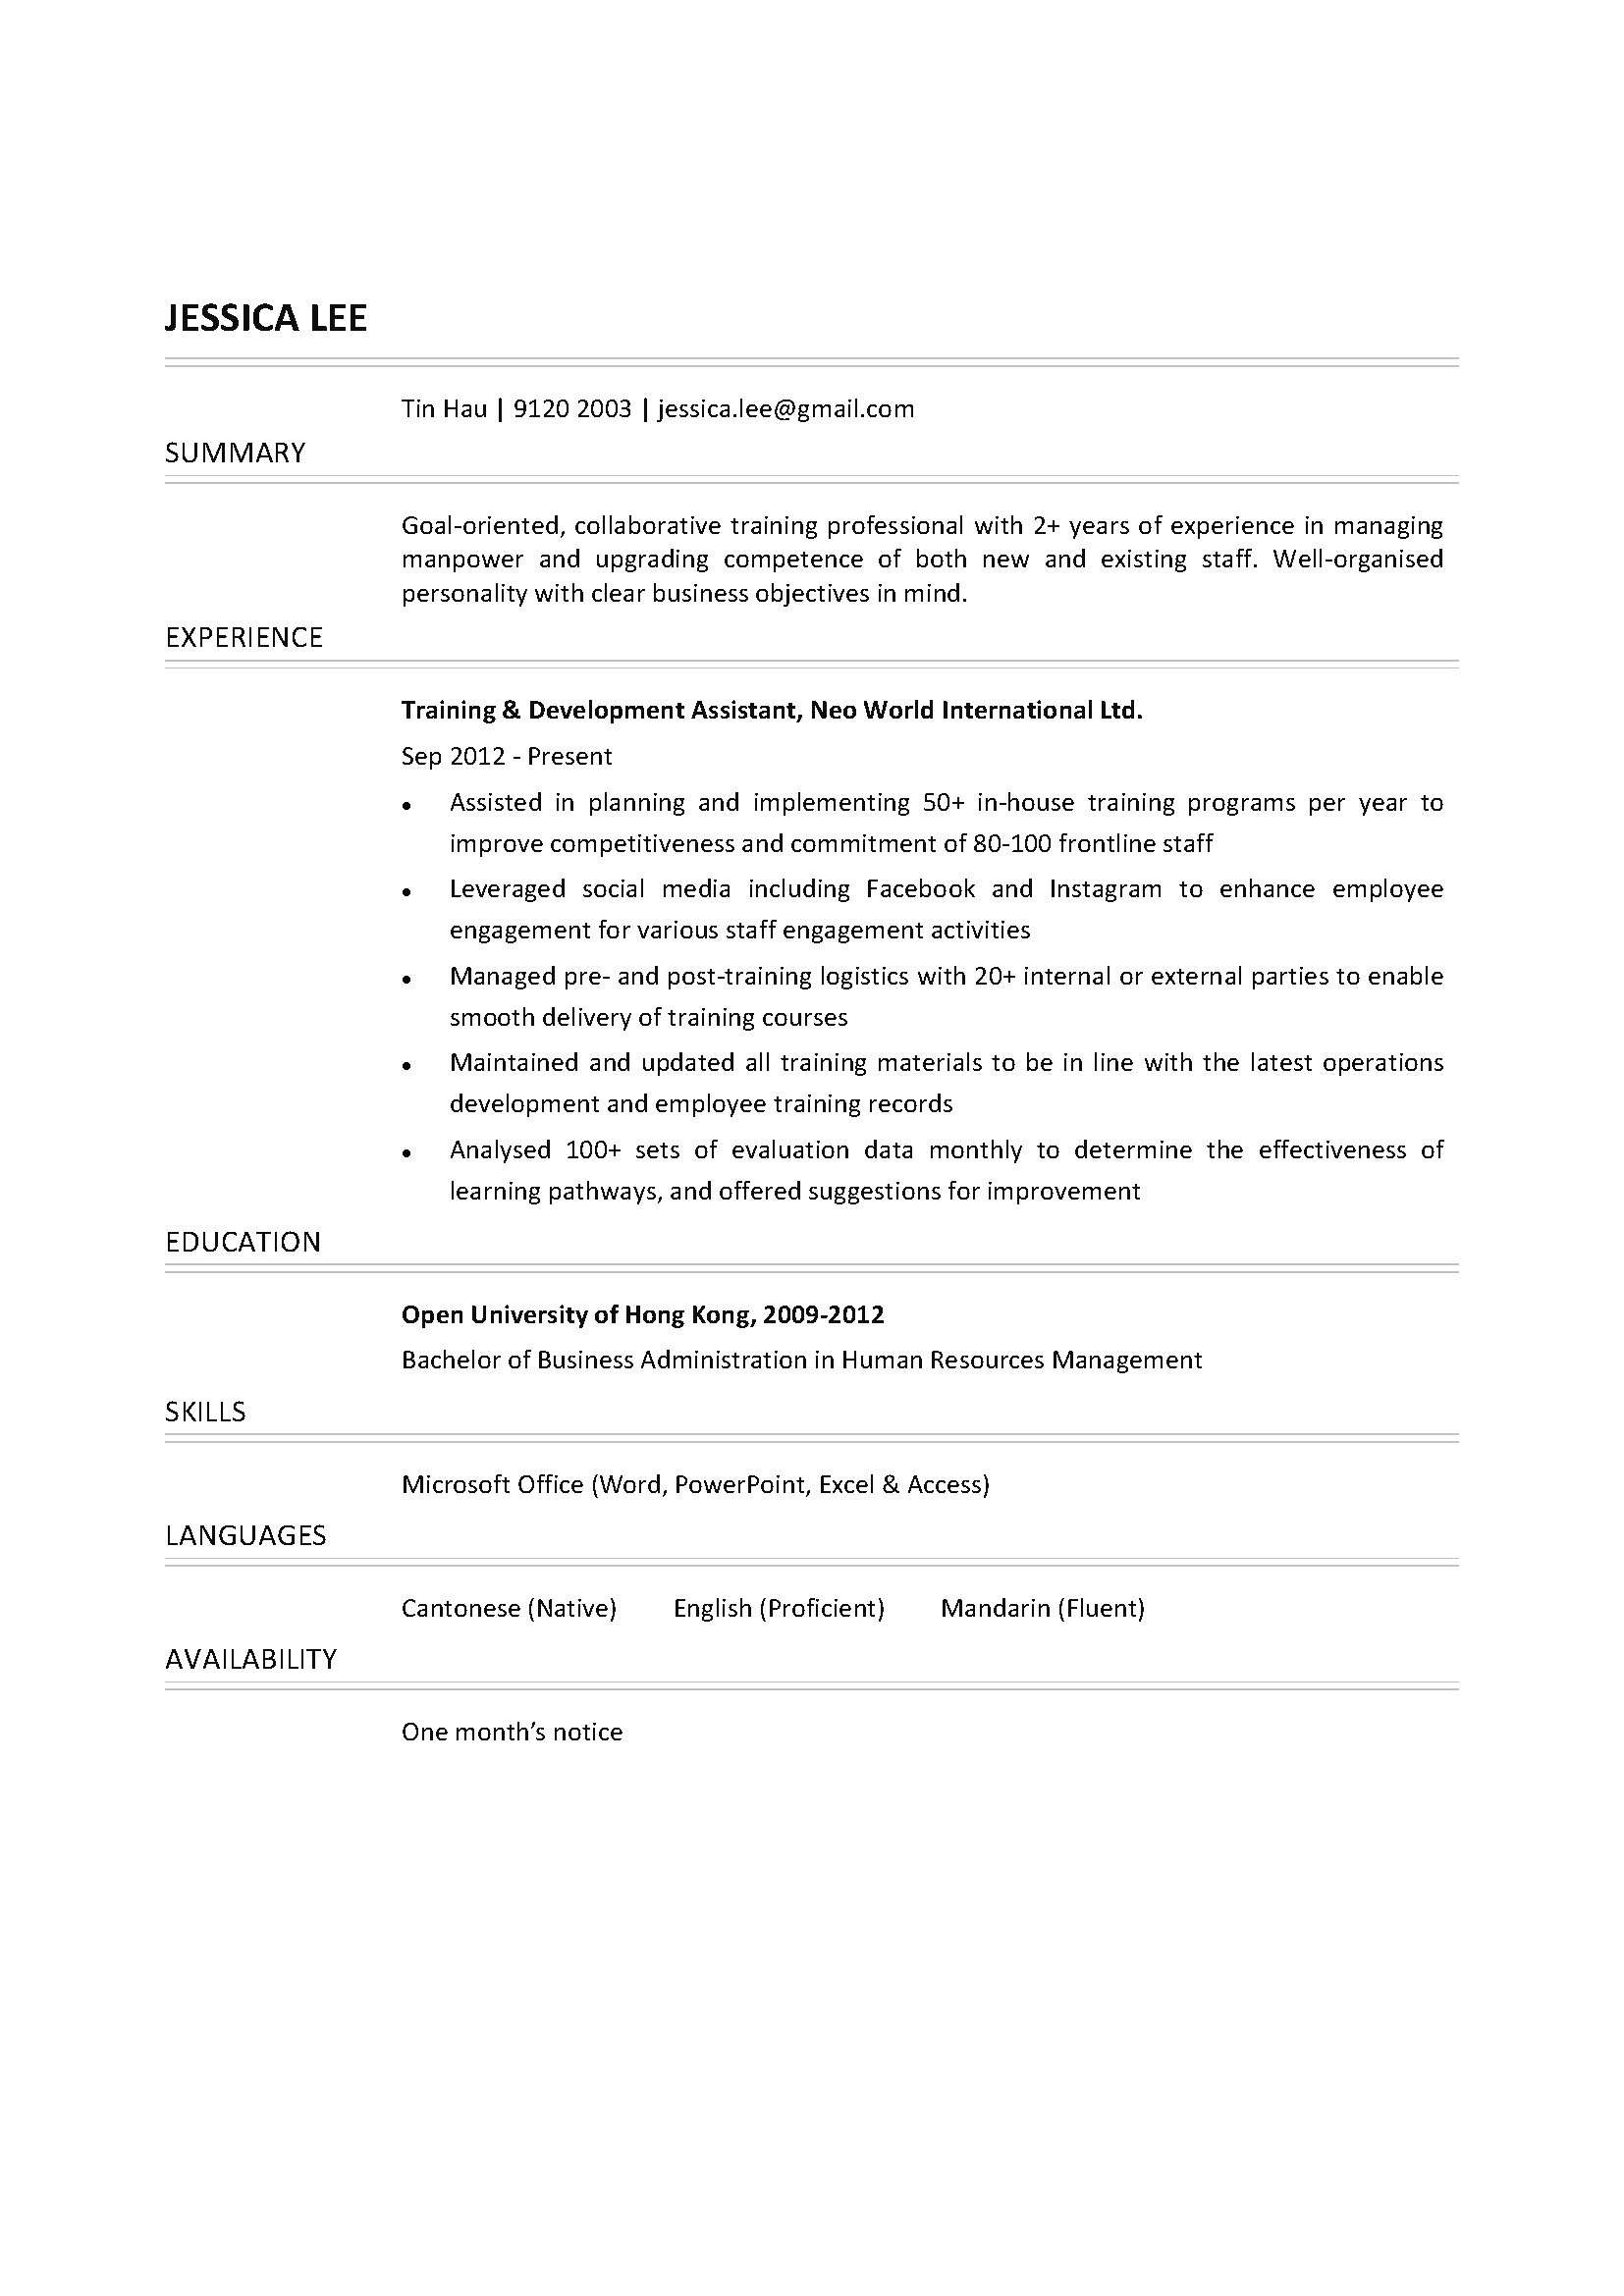 Training & Development Assistant CV